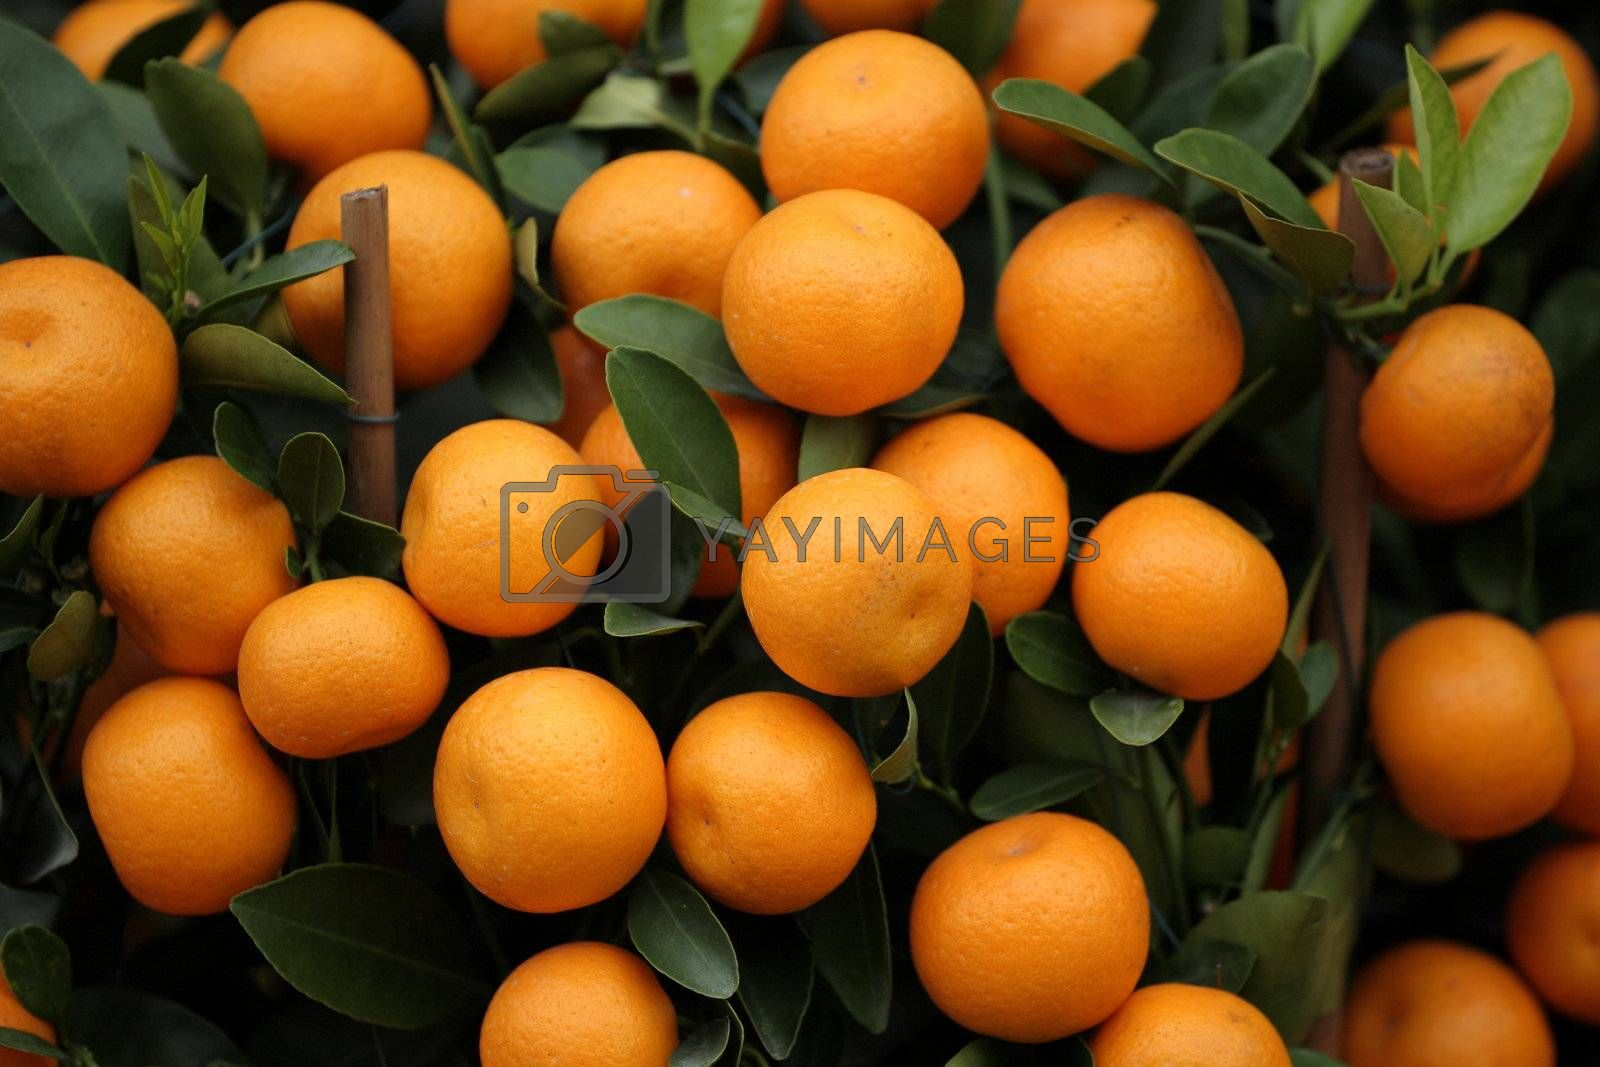 Royalty free image of many kumquat by leungchopan